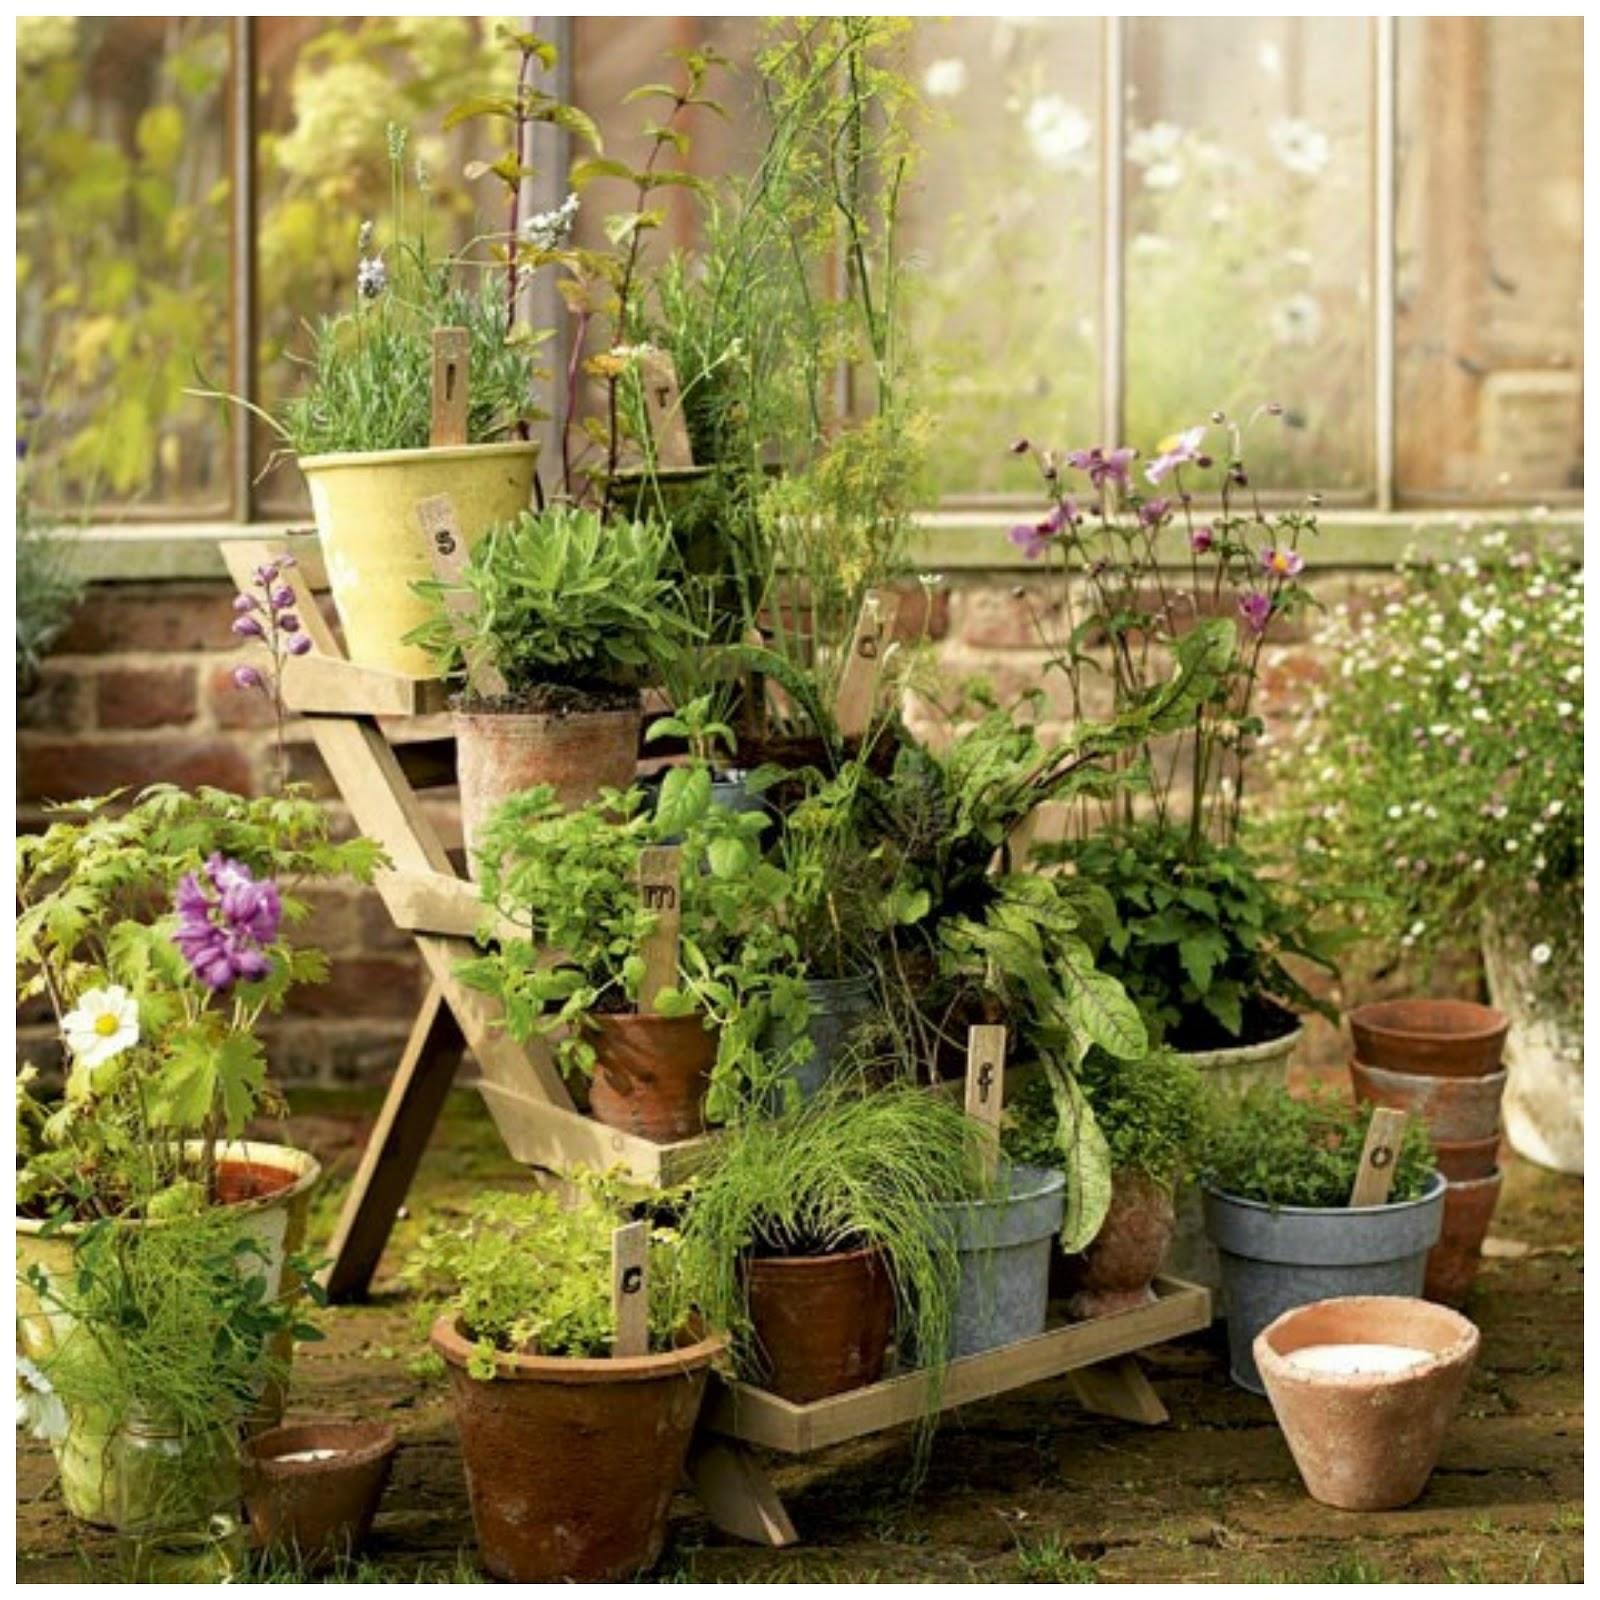 17 Lively Shabby Chic Garden Designs That Will Relax And: Y Tan Flamenca!: En El Jardín